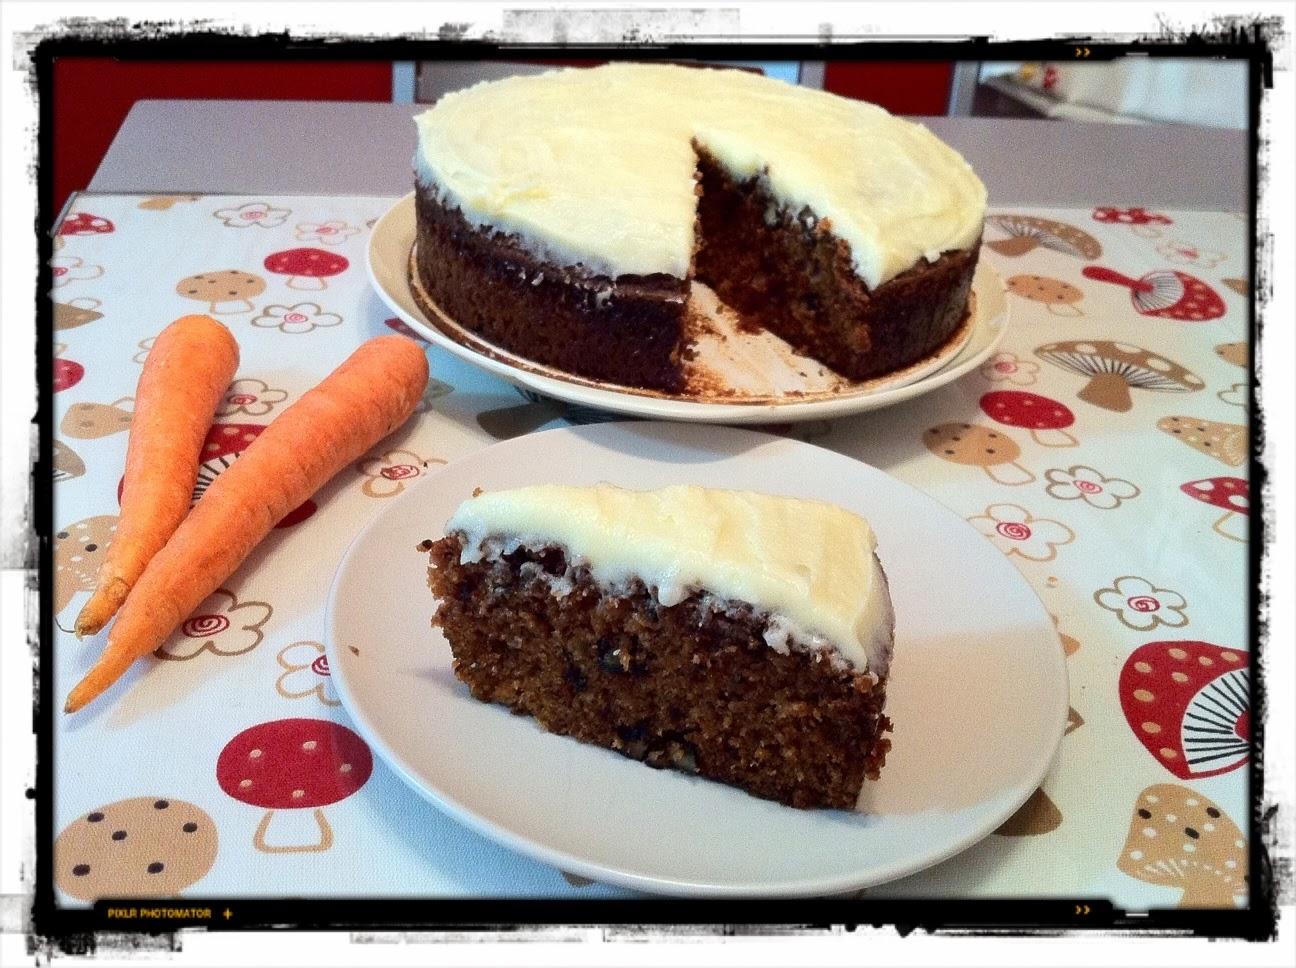 Receta de carrot cake (o pastel de zanahoria)